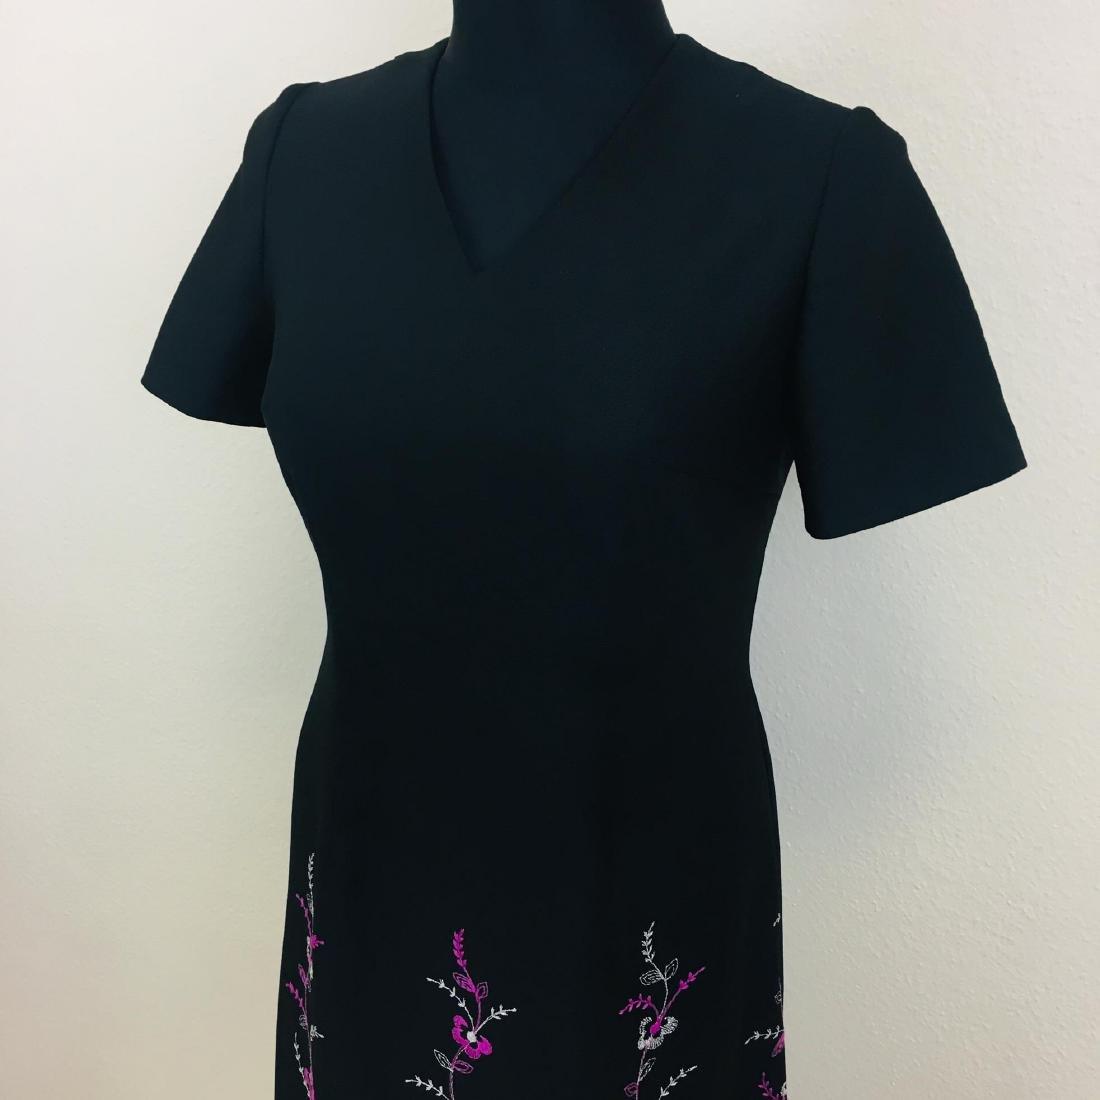 Vintage Women's Long Evening Dress - 2